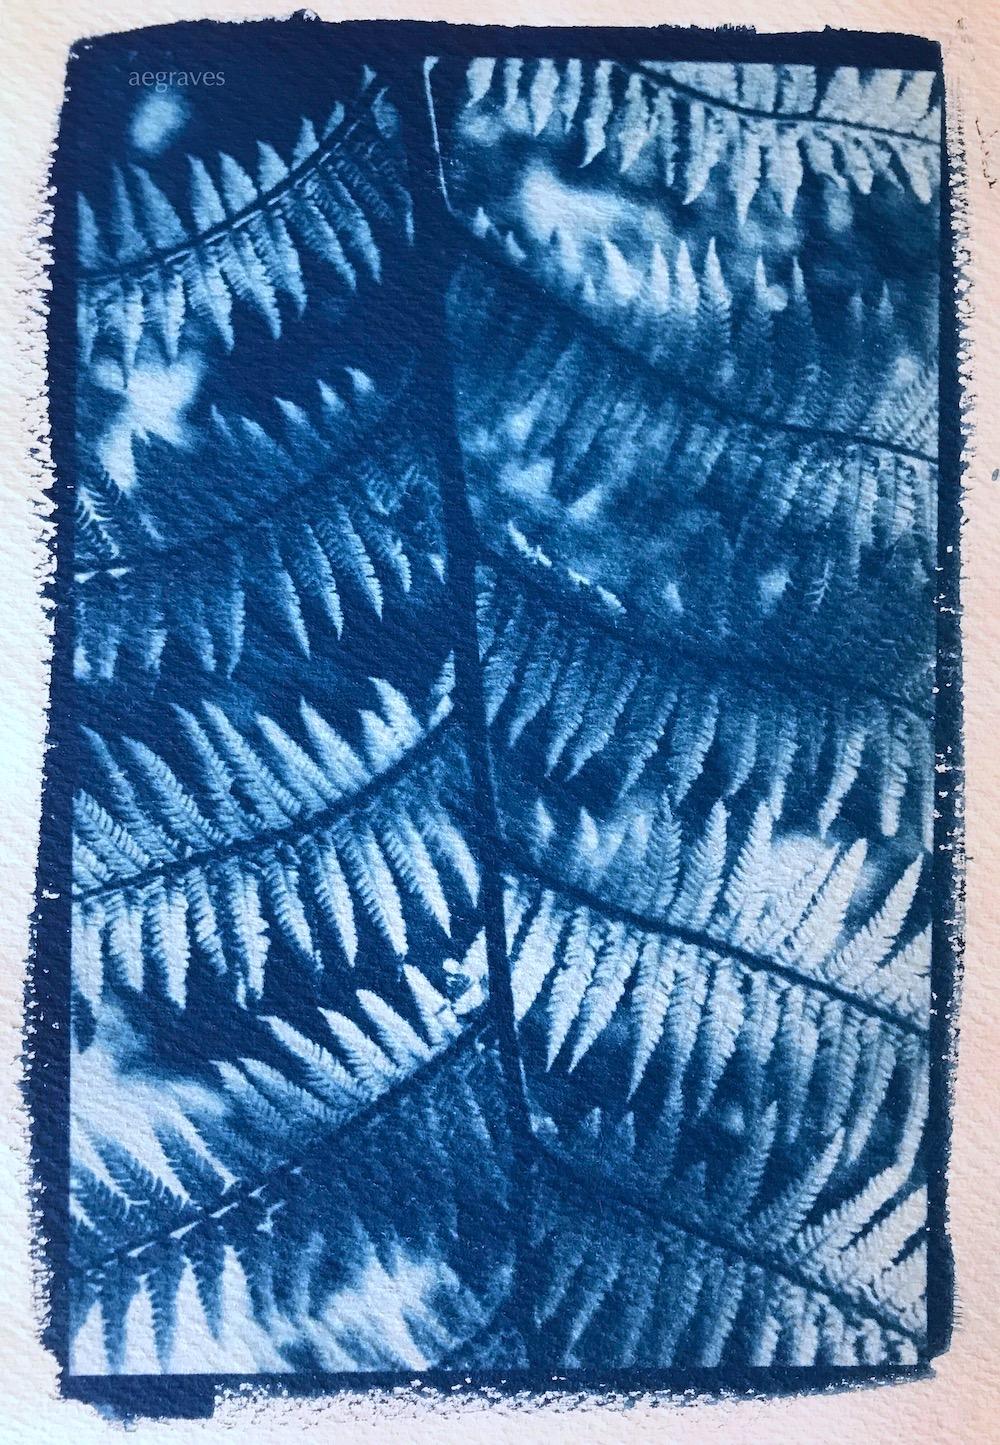 Image of cyanotype of ferns